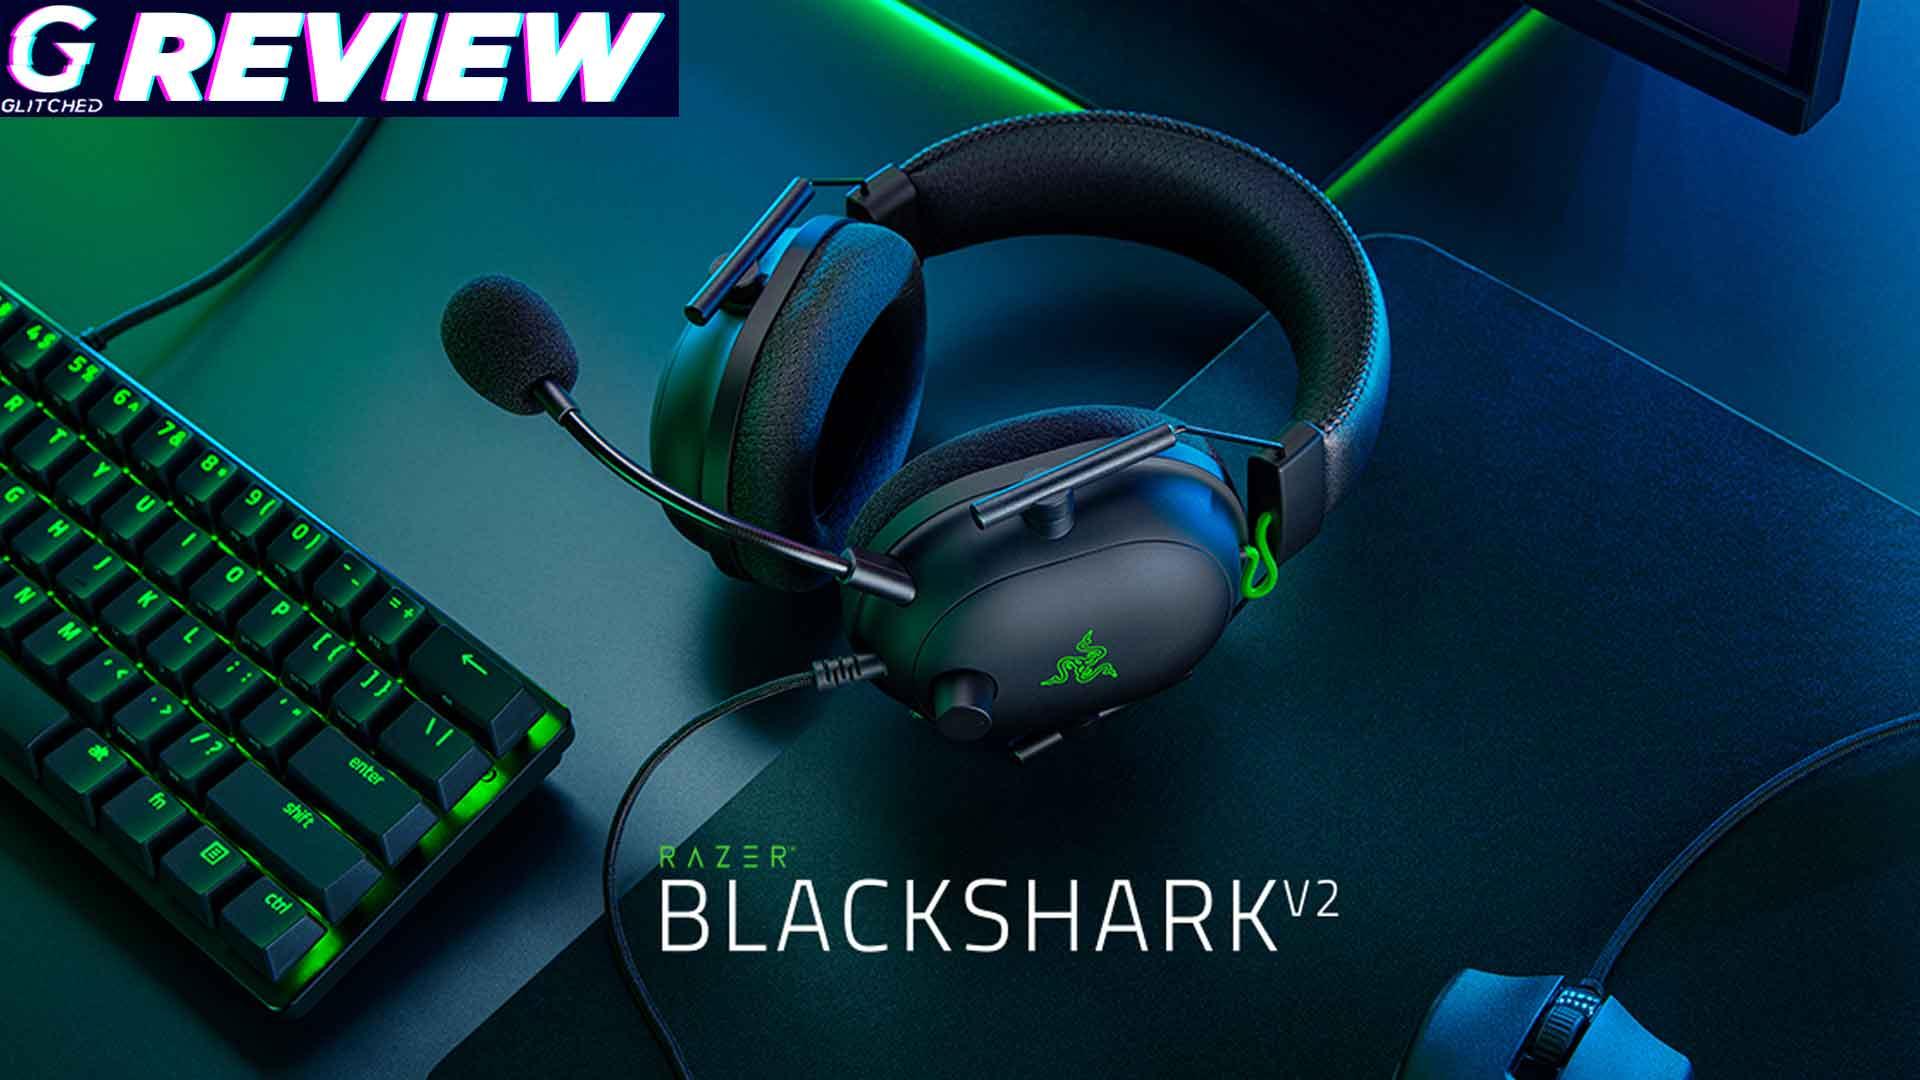 Razer BlackShark V2 X Review